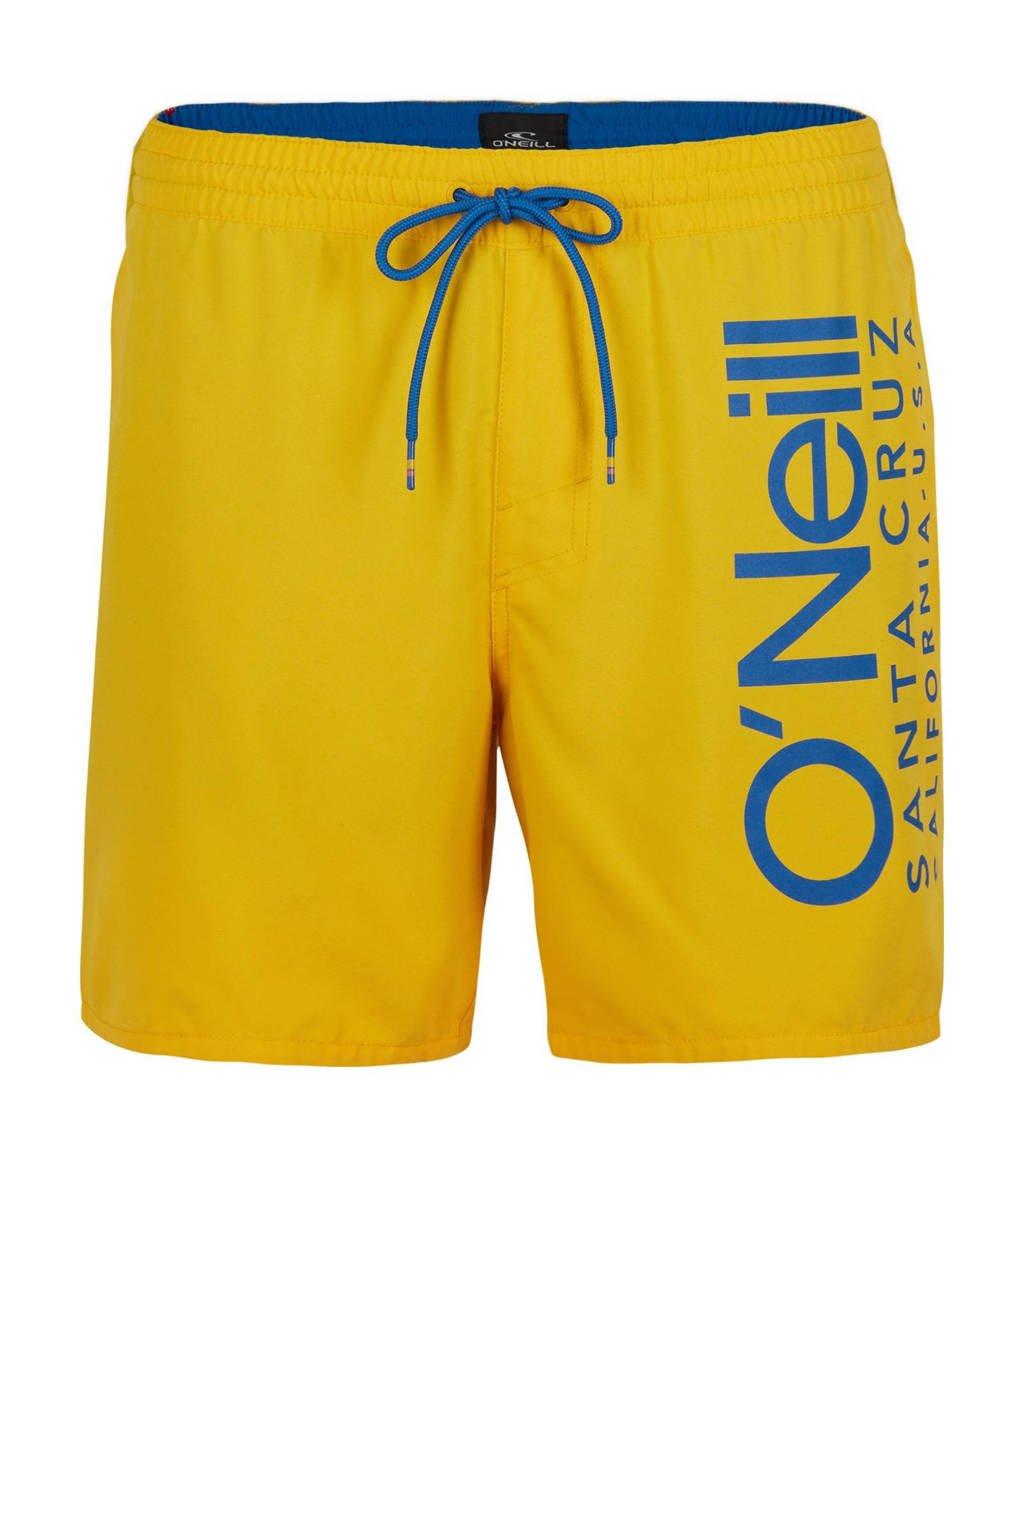 O'Neill Blue zwemshort Cali met logo geel/blauw, Geel